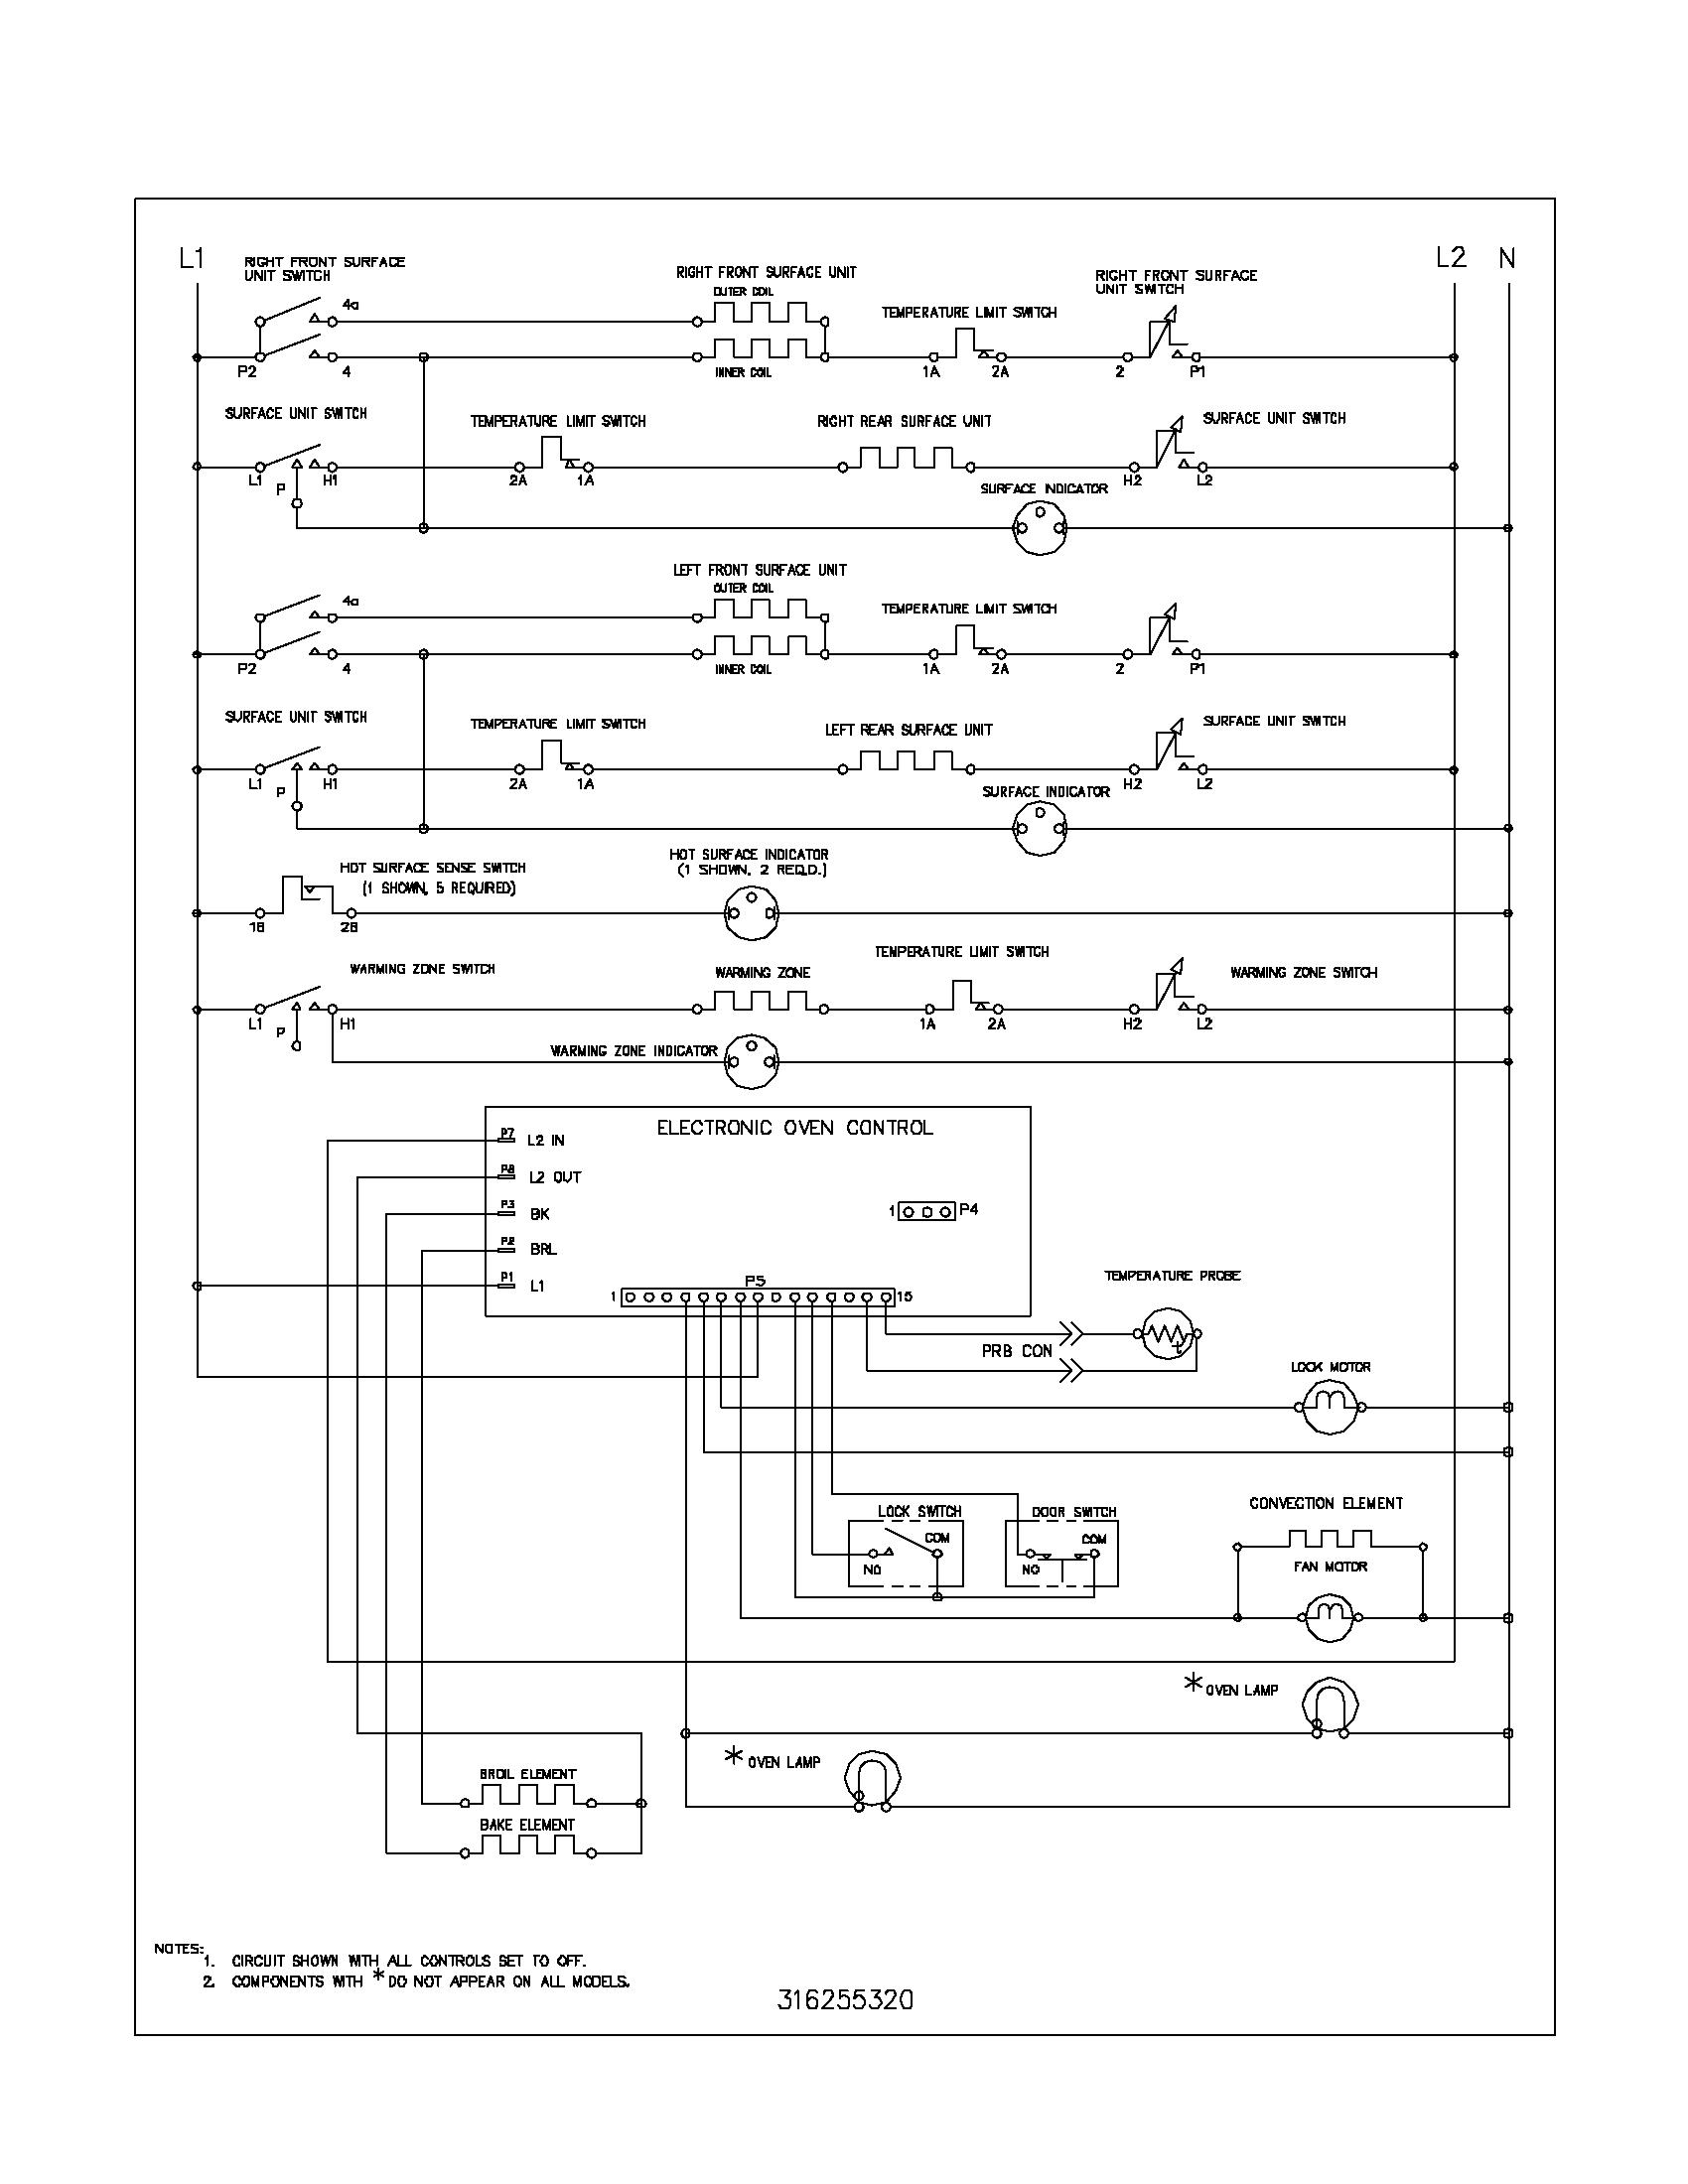 35 Whirlpool Electric Range Wiring Diagram - Free Wiring Diagram Source | Whirlpool Stove Wiring Diagram |  | Free Wiring Diagram Source